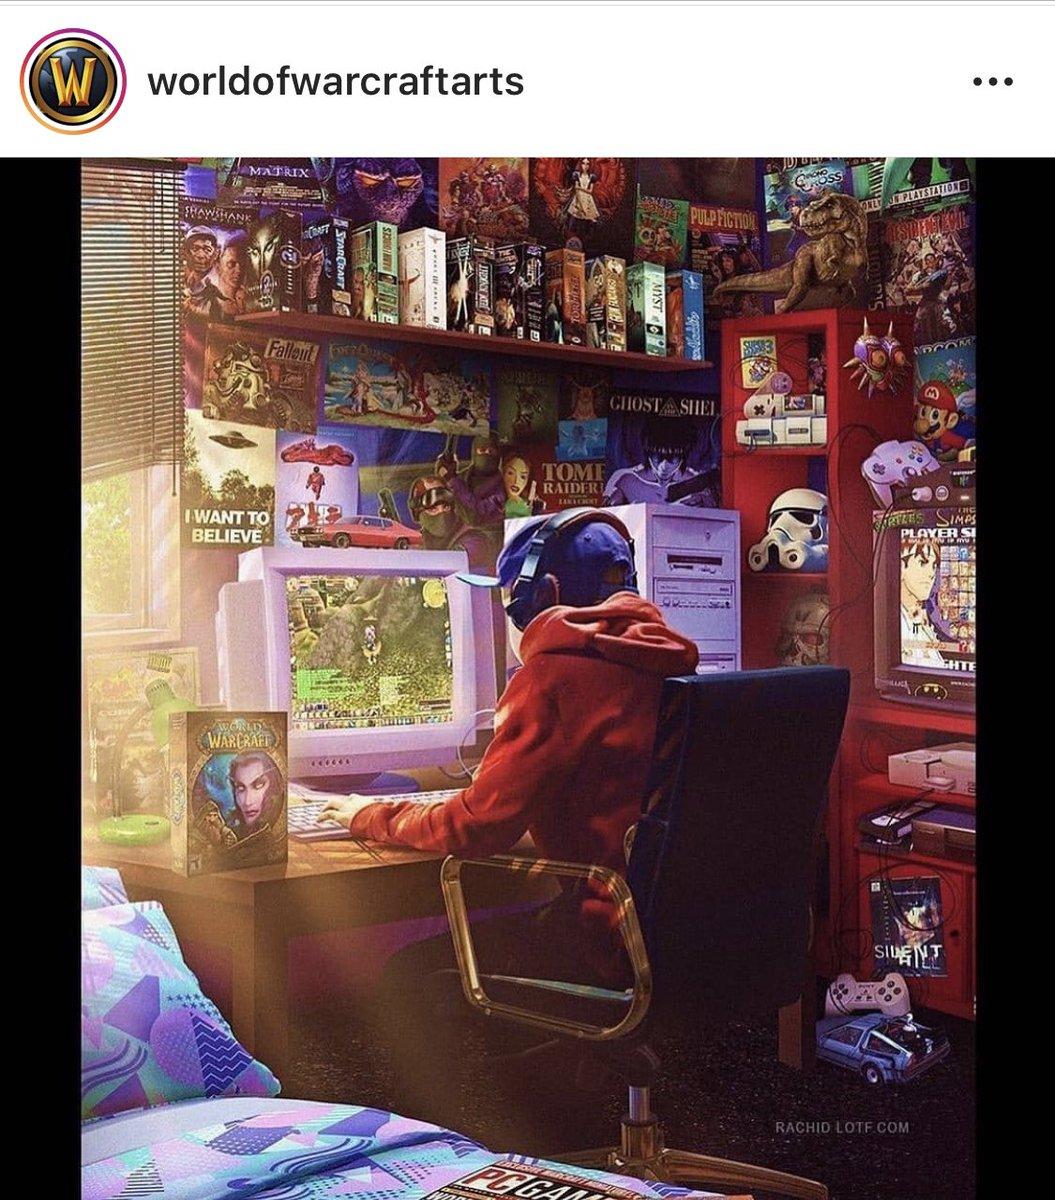 Me flipa esta imagen que ha subido a instagram en la cuenta de worldofwarcraftarts !! #gamingart #gamedev #gamingdev #gameartistpic.twitter.com/cIzwgiq3Gb